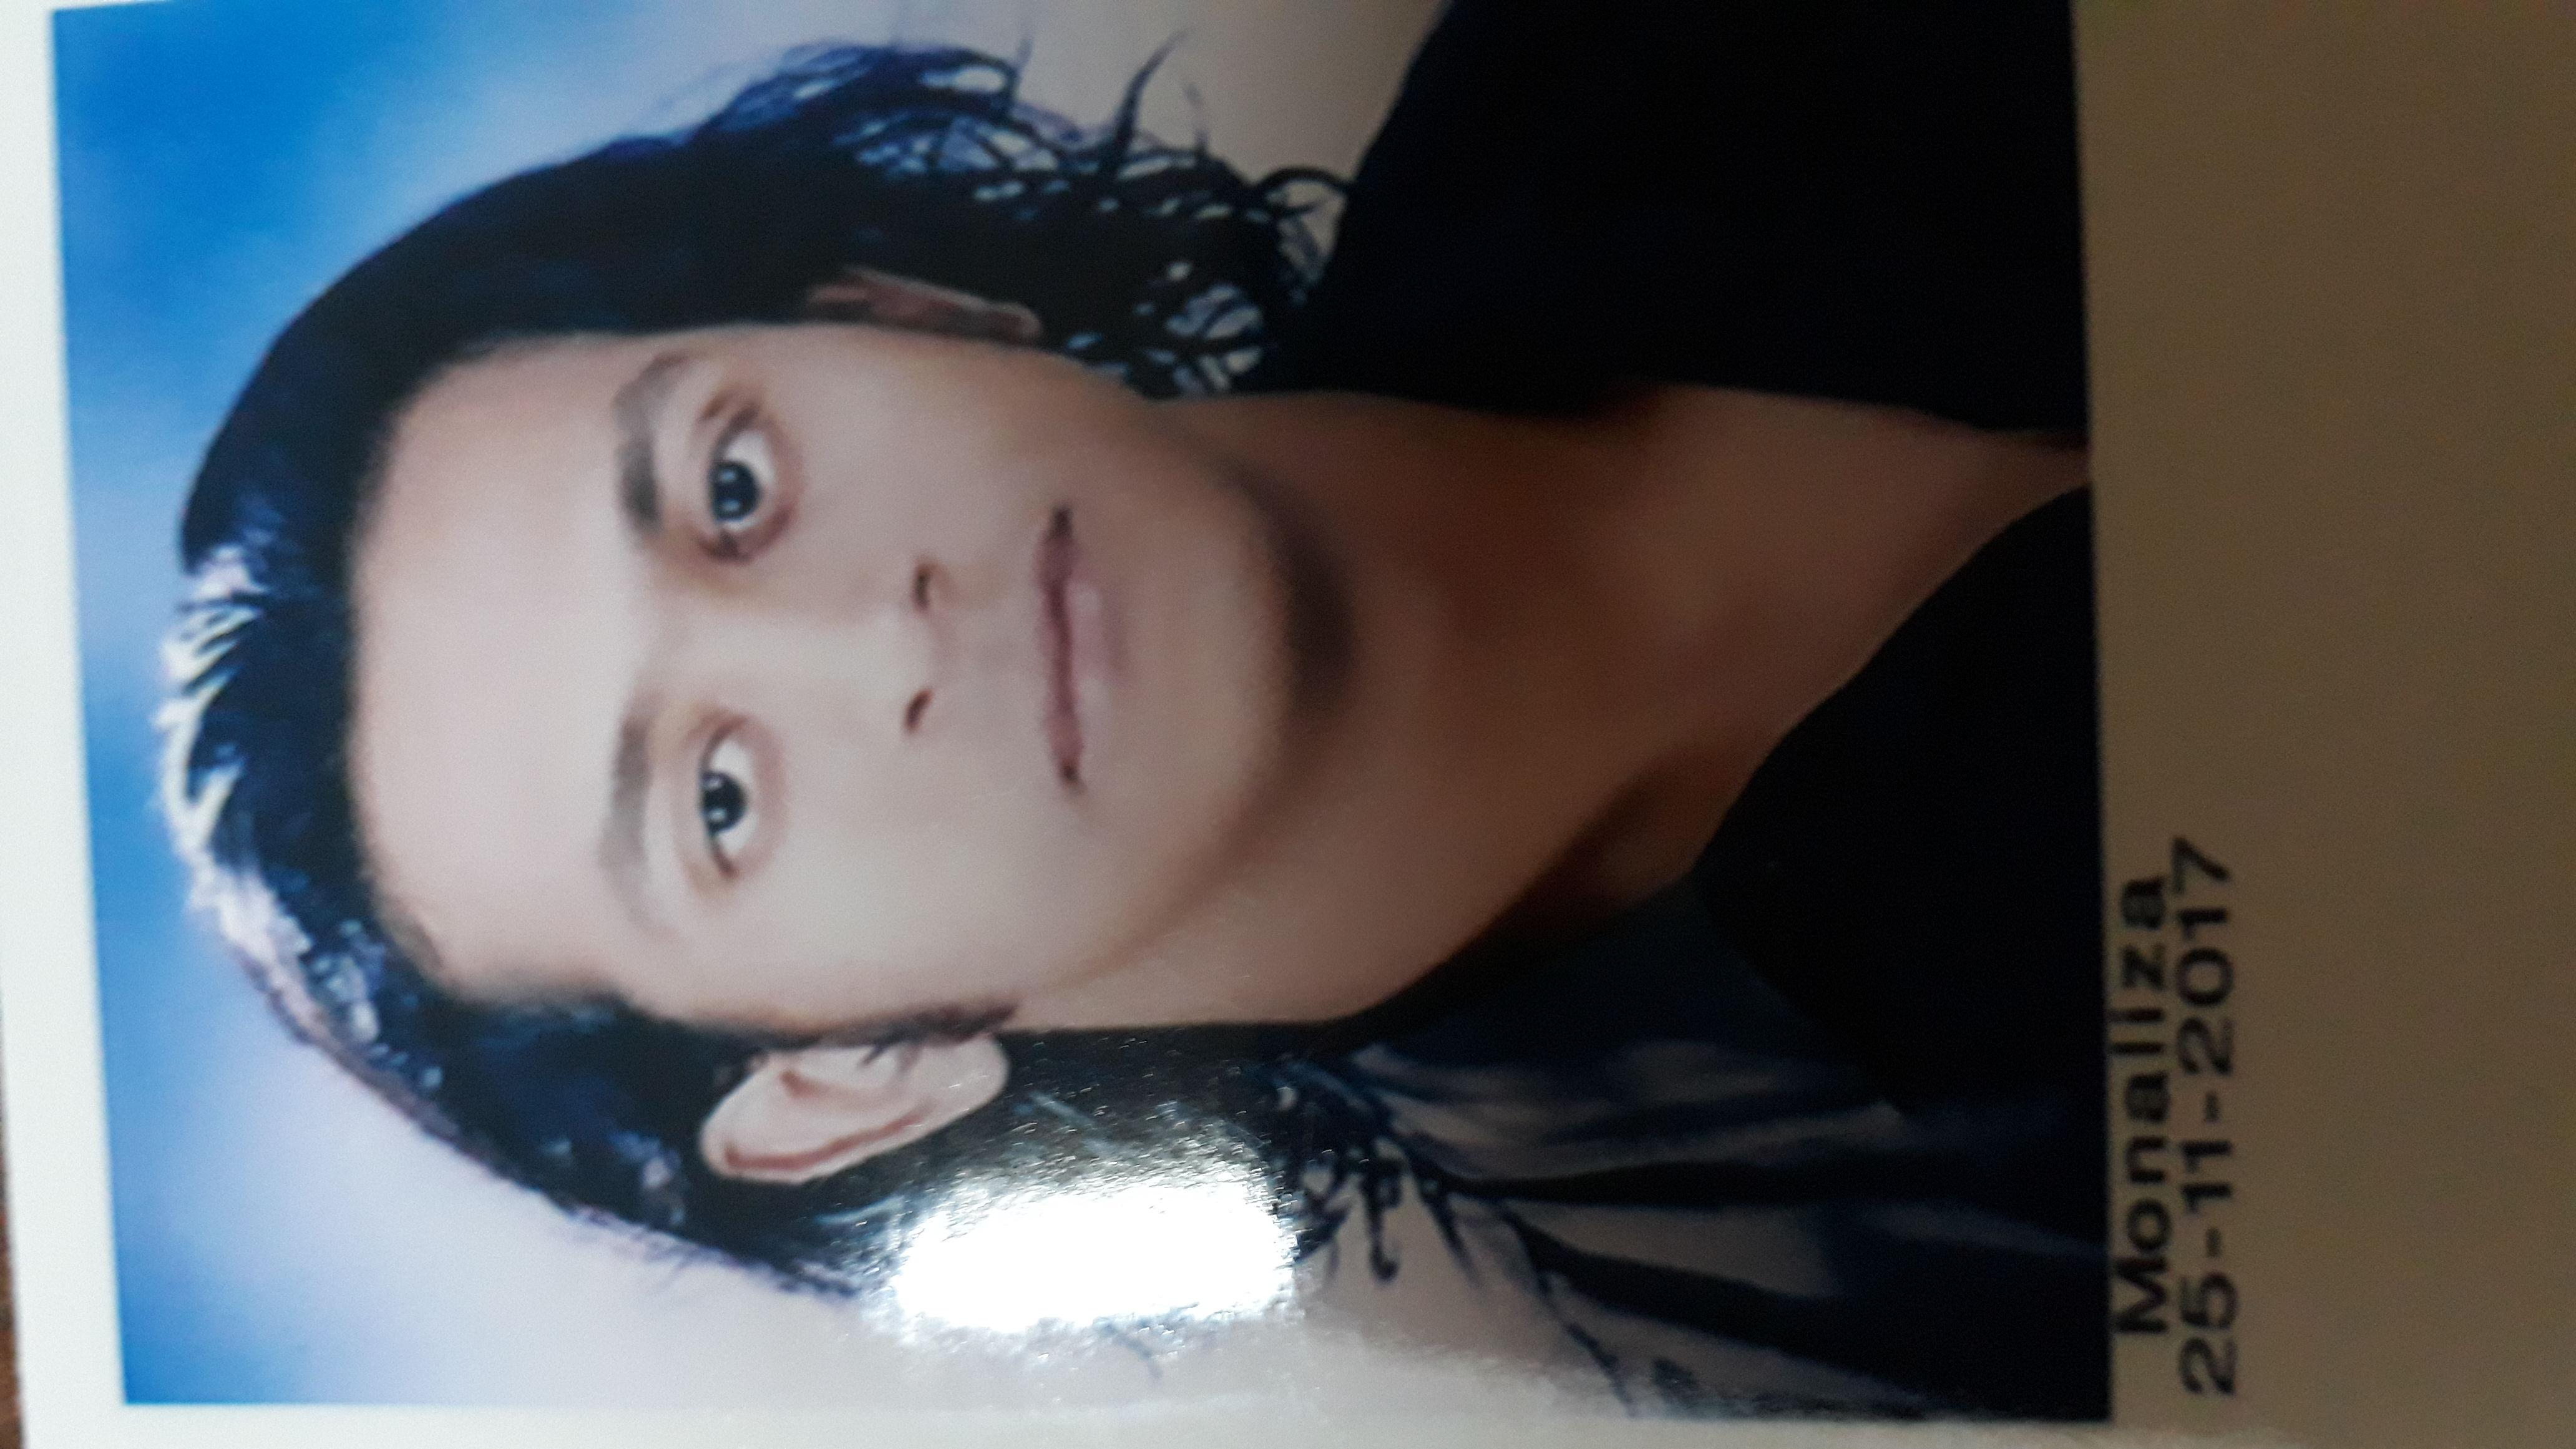 AlaaMahmoudhussein Profile Picture